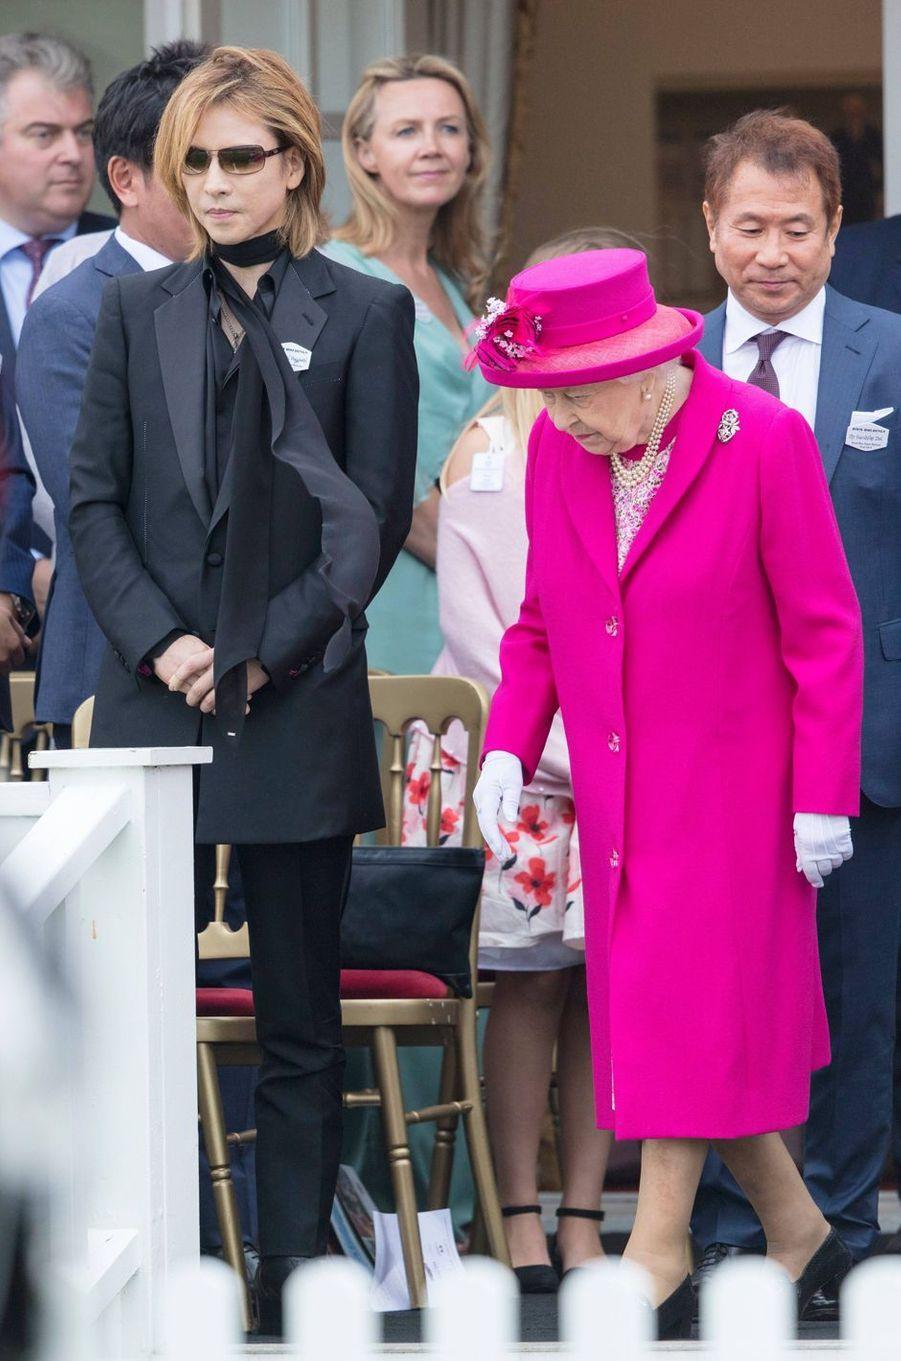 La reine Elizabeth II à Windsor avec Yoskiki du groupe de rock X Japan, le 23 juin 2019